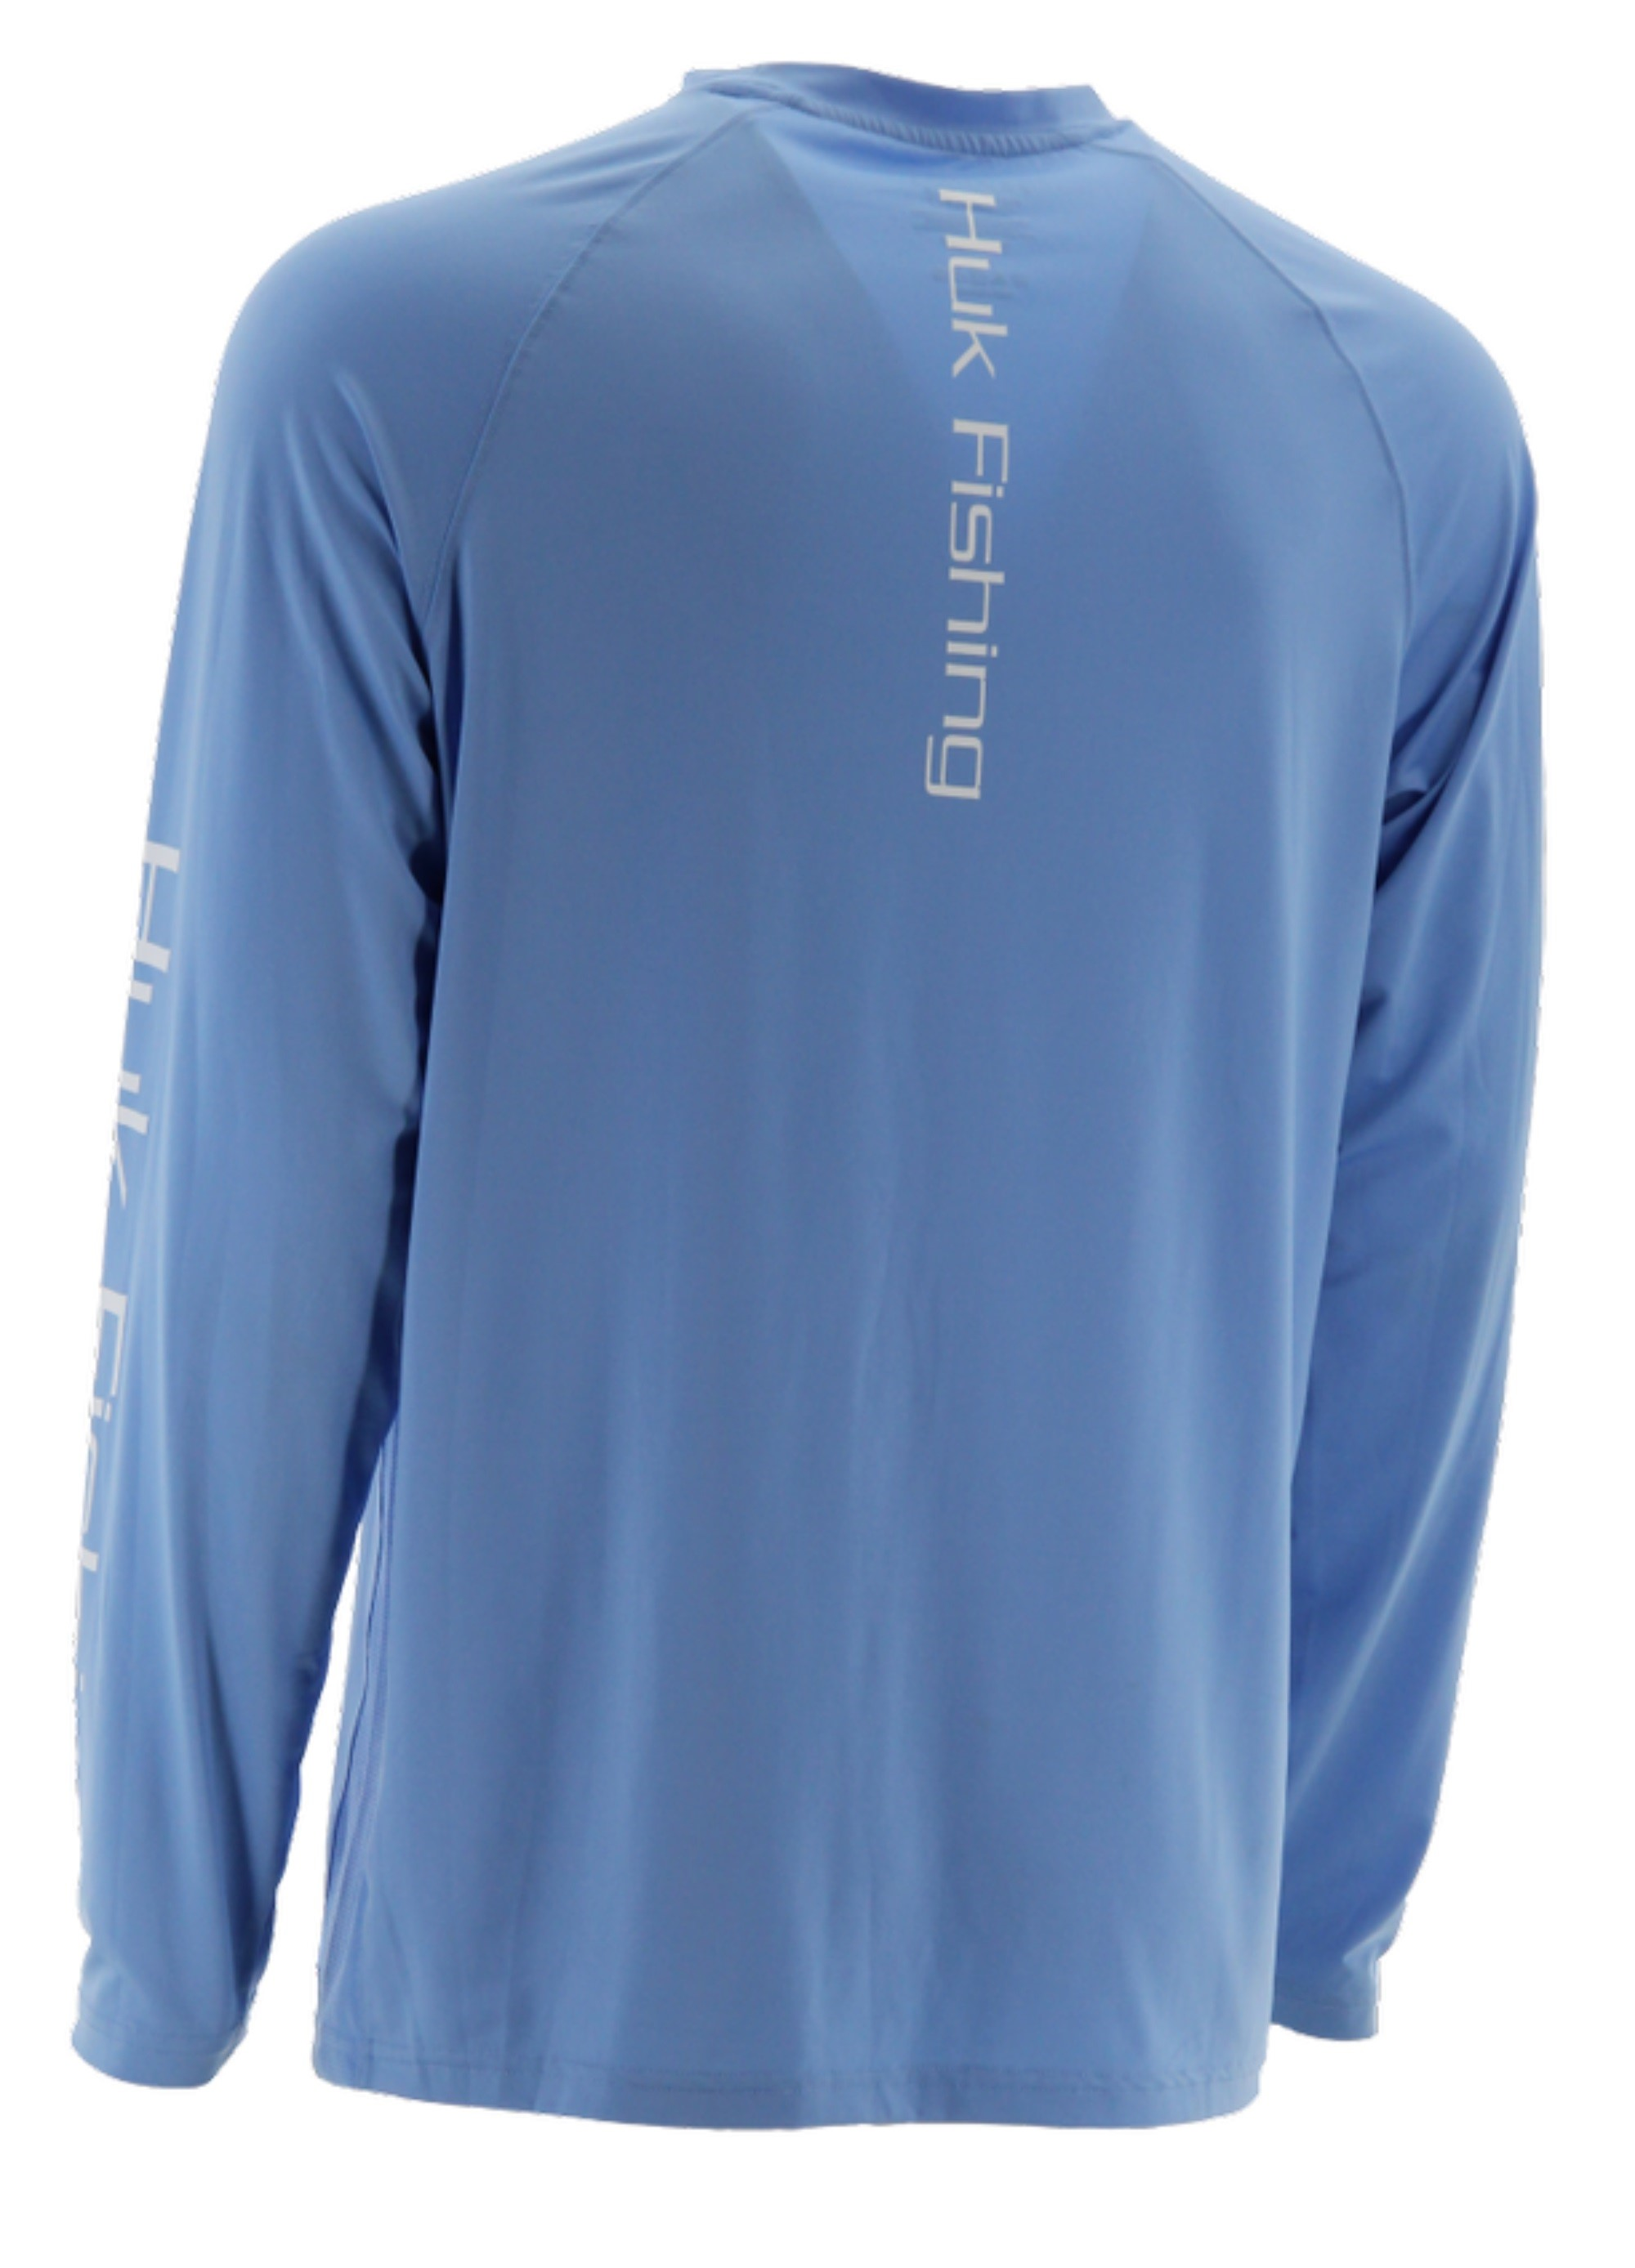 HUK Mens Pursuit Vented Long Sleeve Shirt H1200150